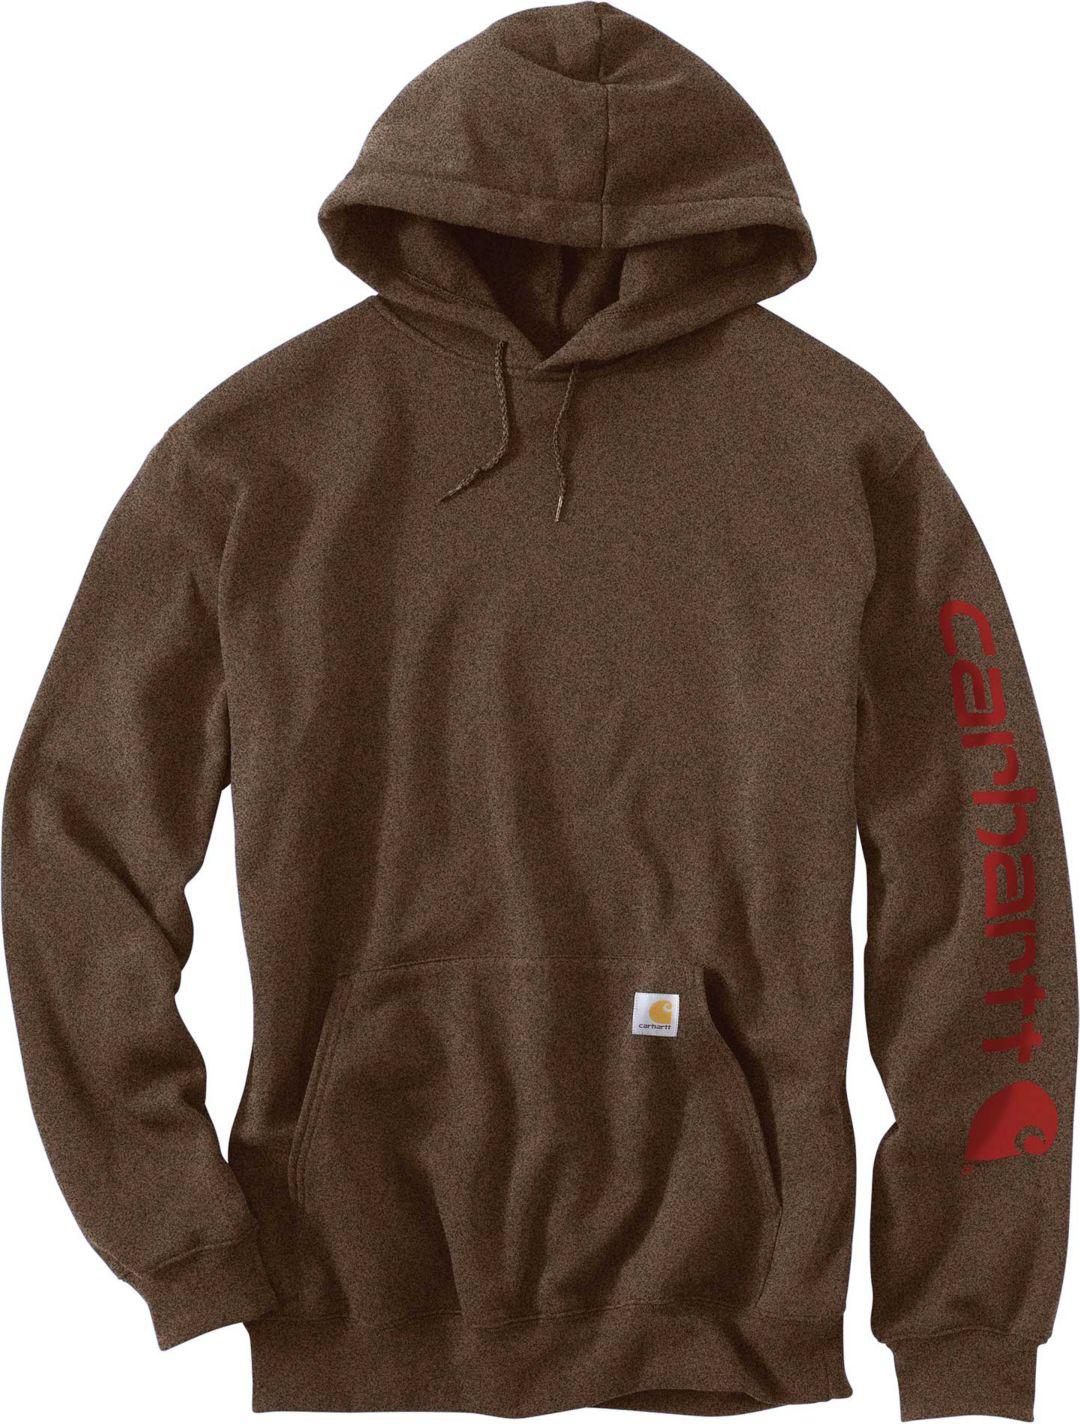 f46ac272c Carhartt Men's Midweight Hooded Logo Sleeve Sweatshirt. noImageFound. 1